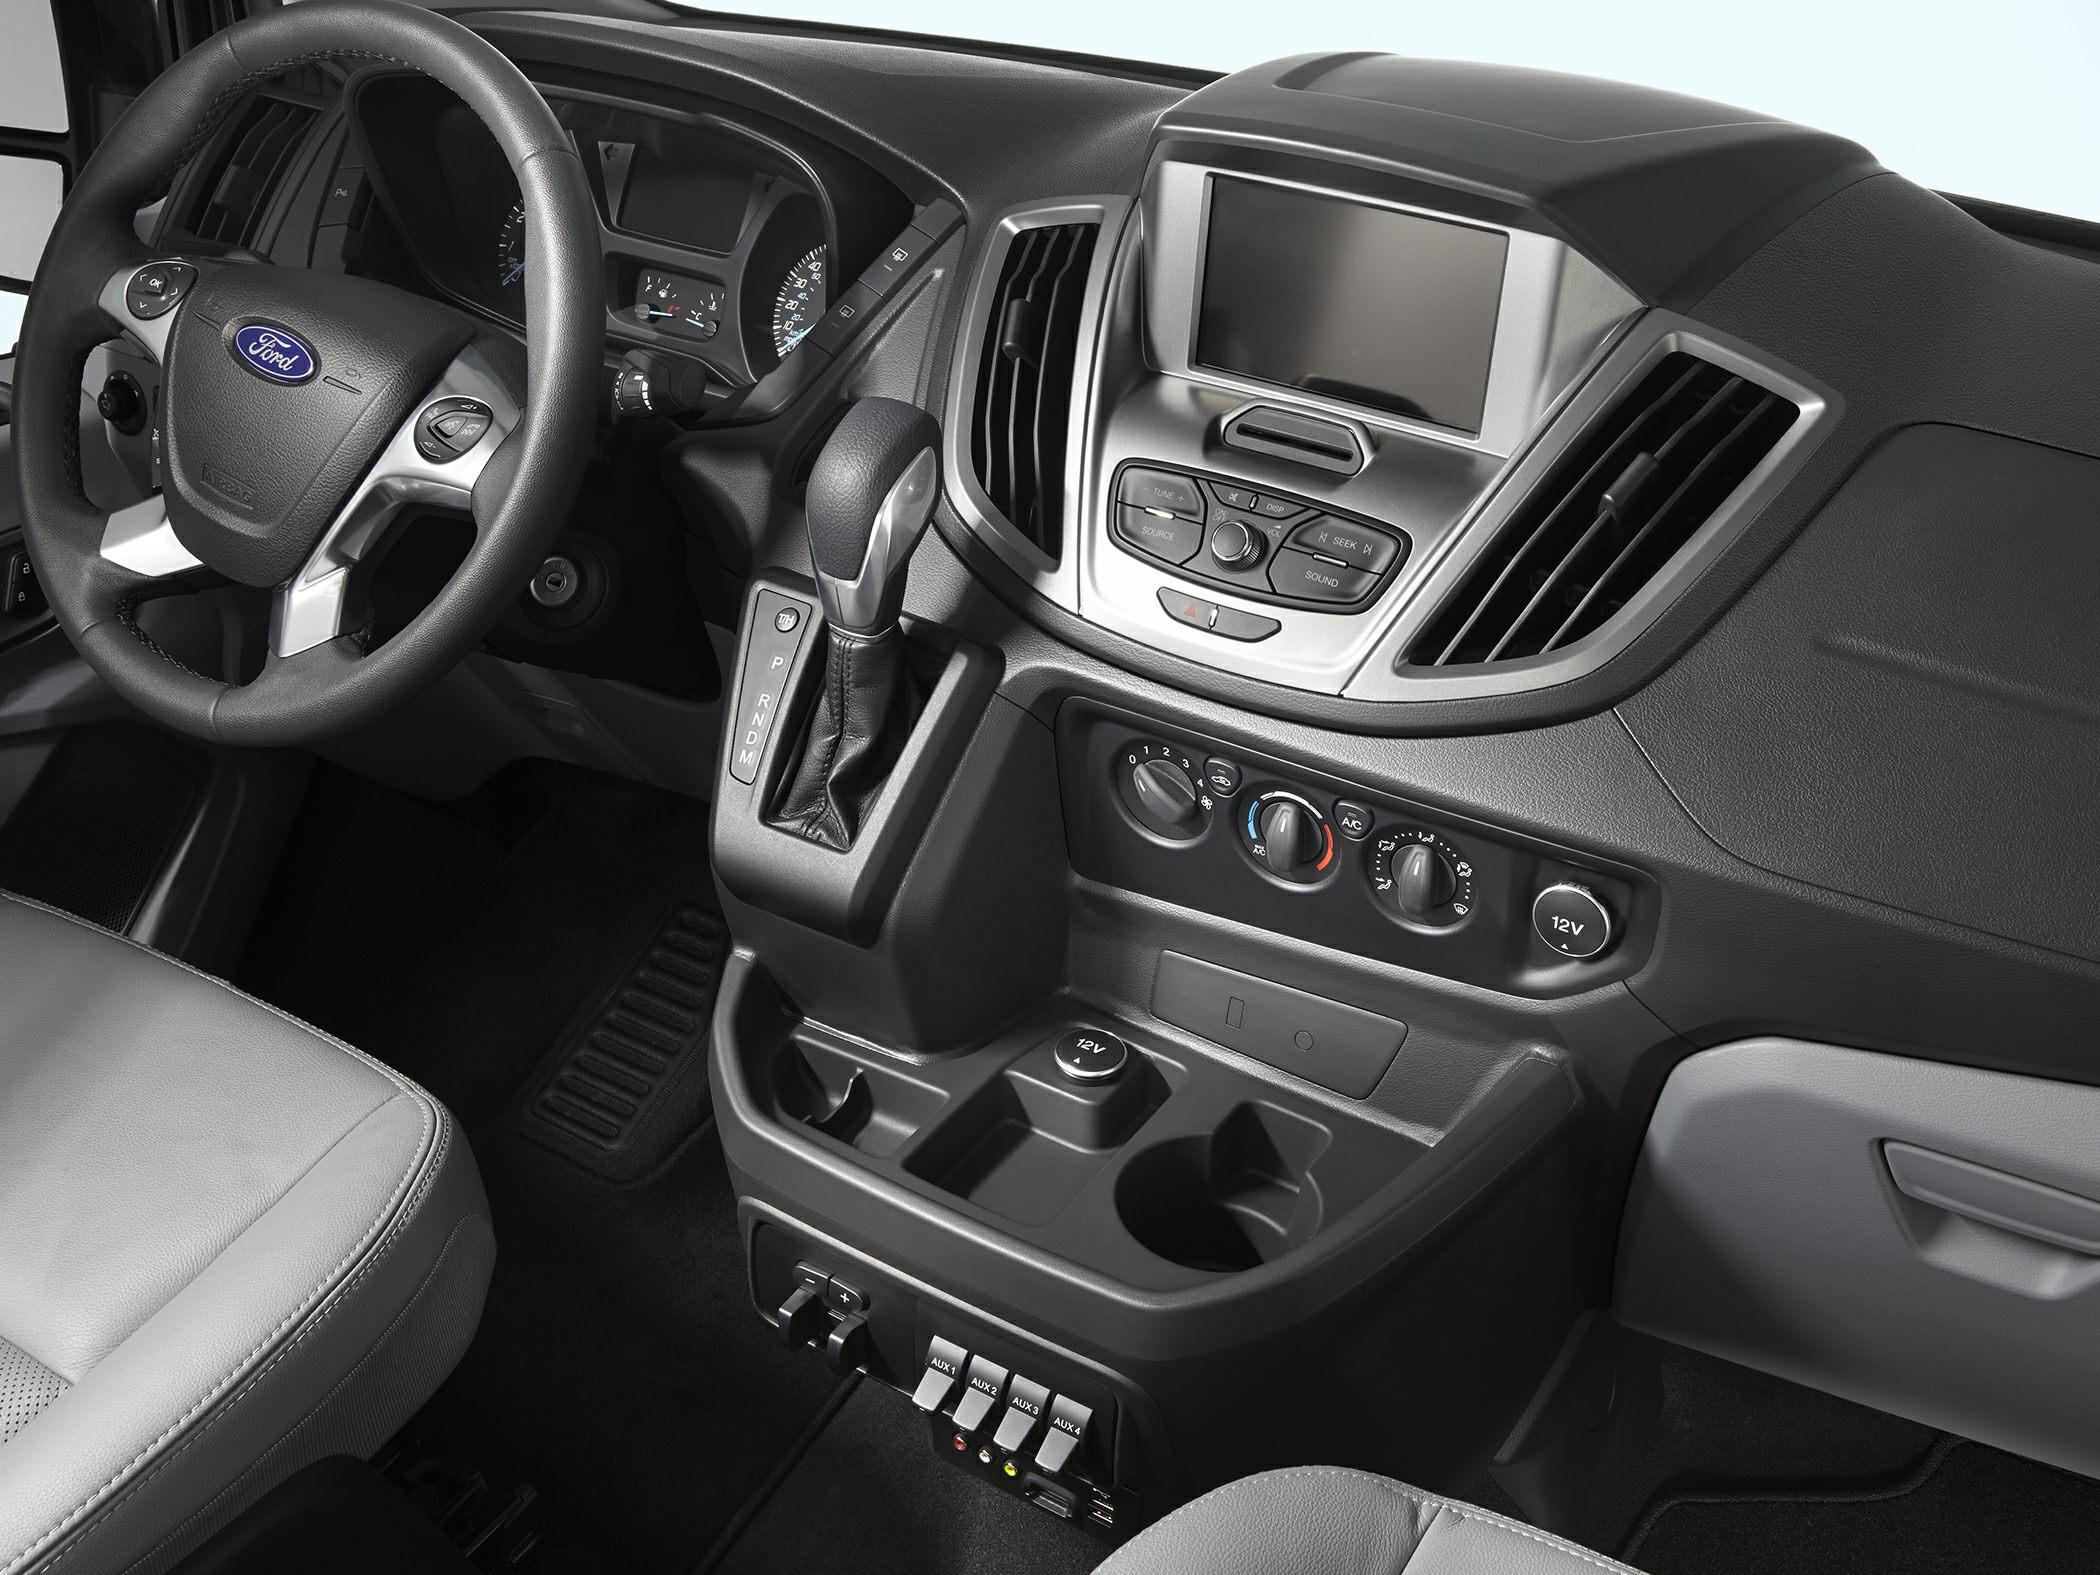 2017 Ford Transit Van >> Ford Transit-150 Cargo Van Models, Price, Specs, Reviews   Cars.com